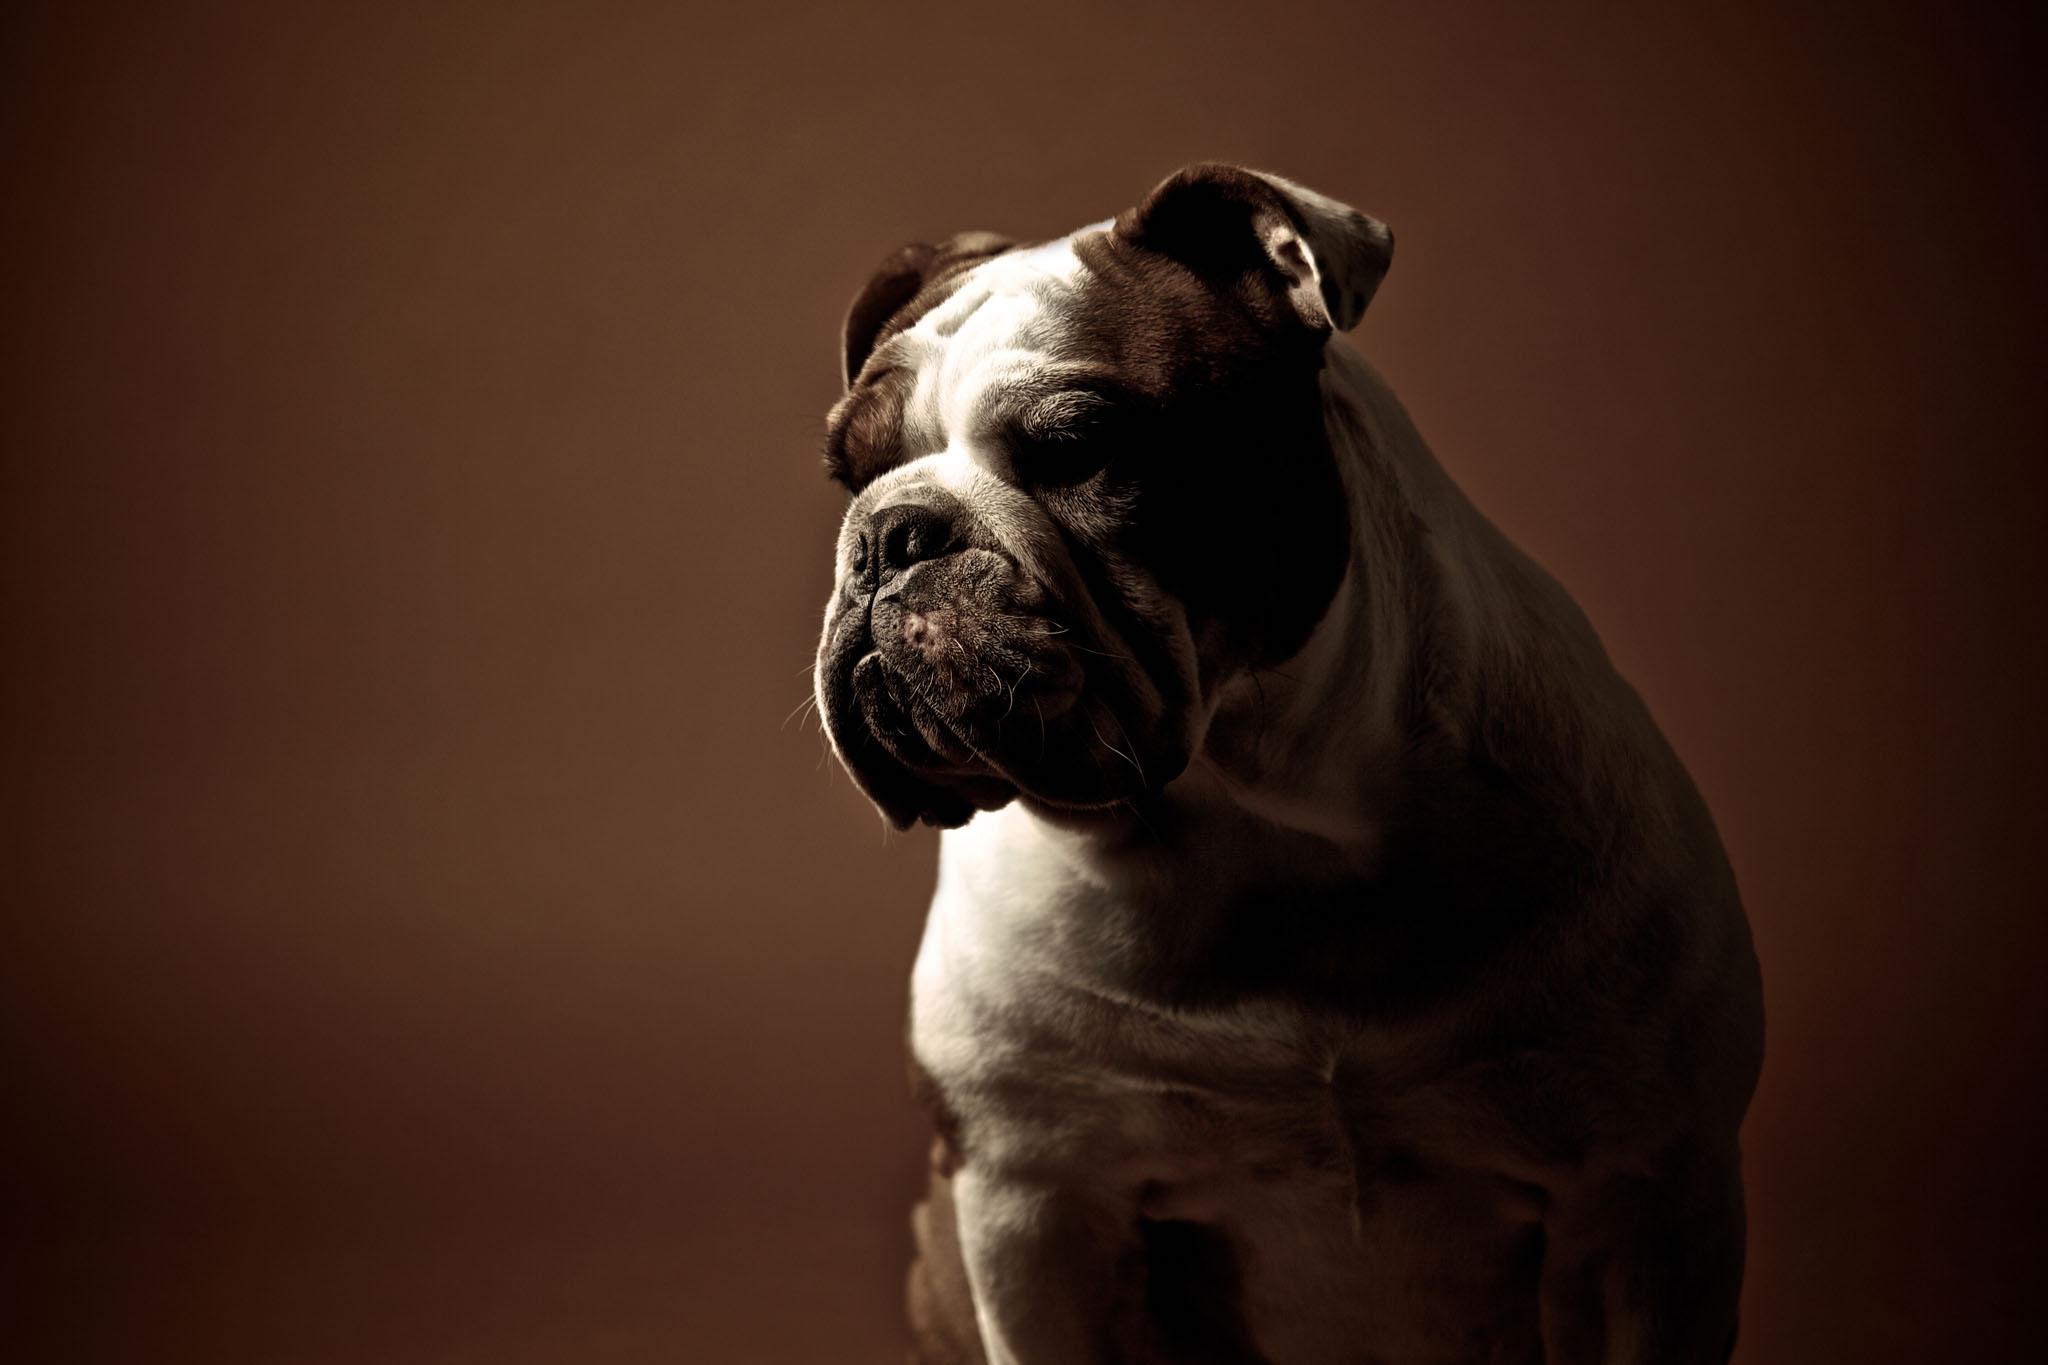 boprey-pet-photography-studio-nyc_6.jpg